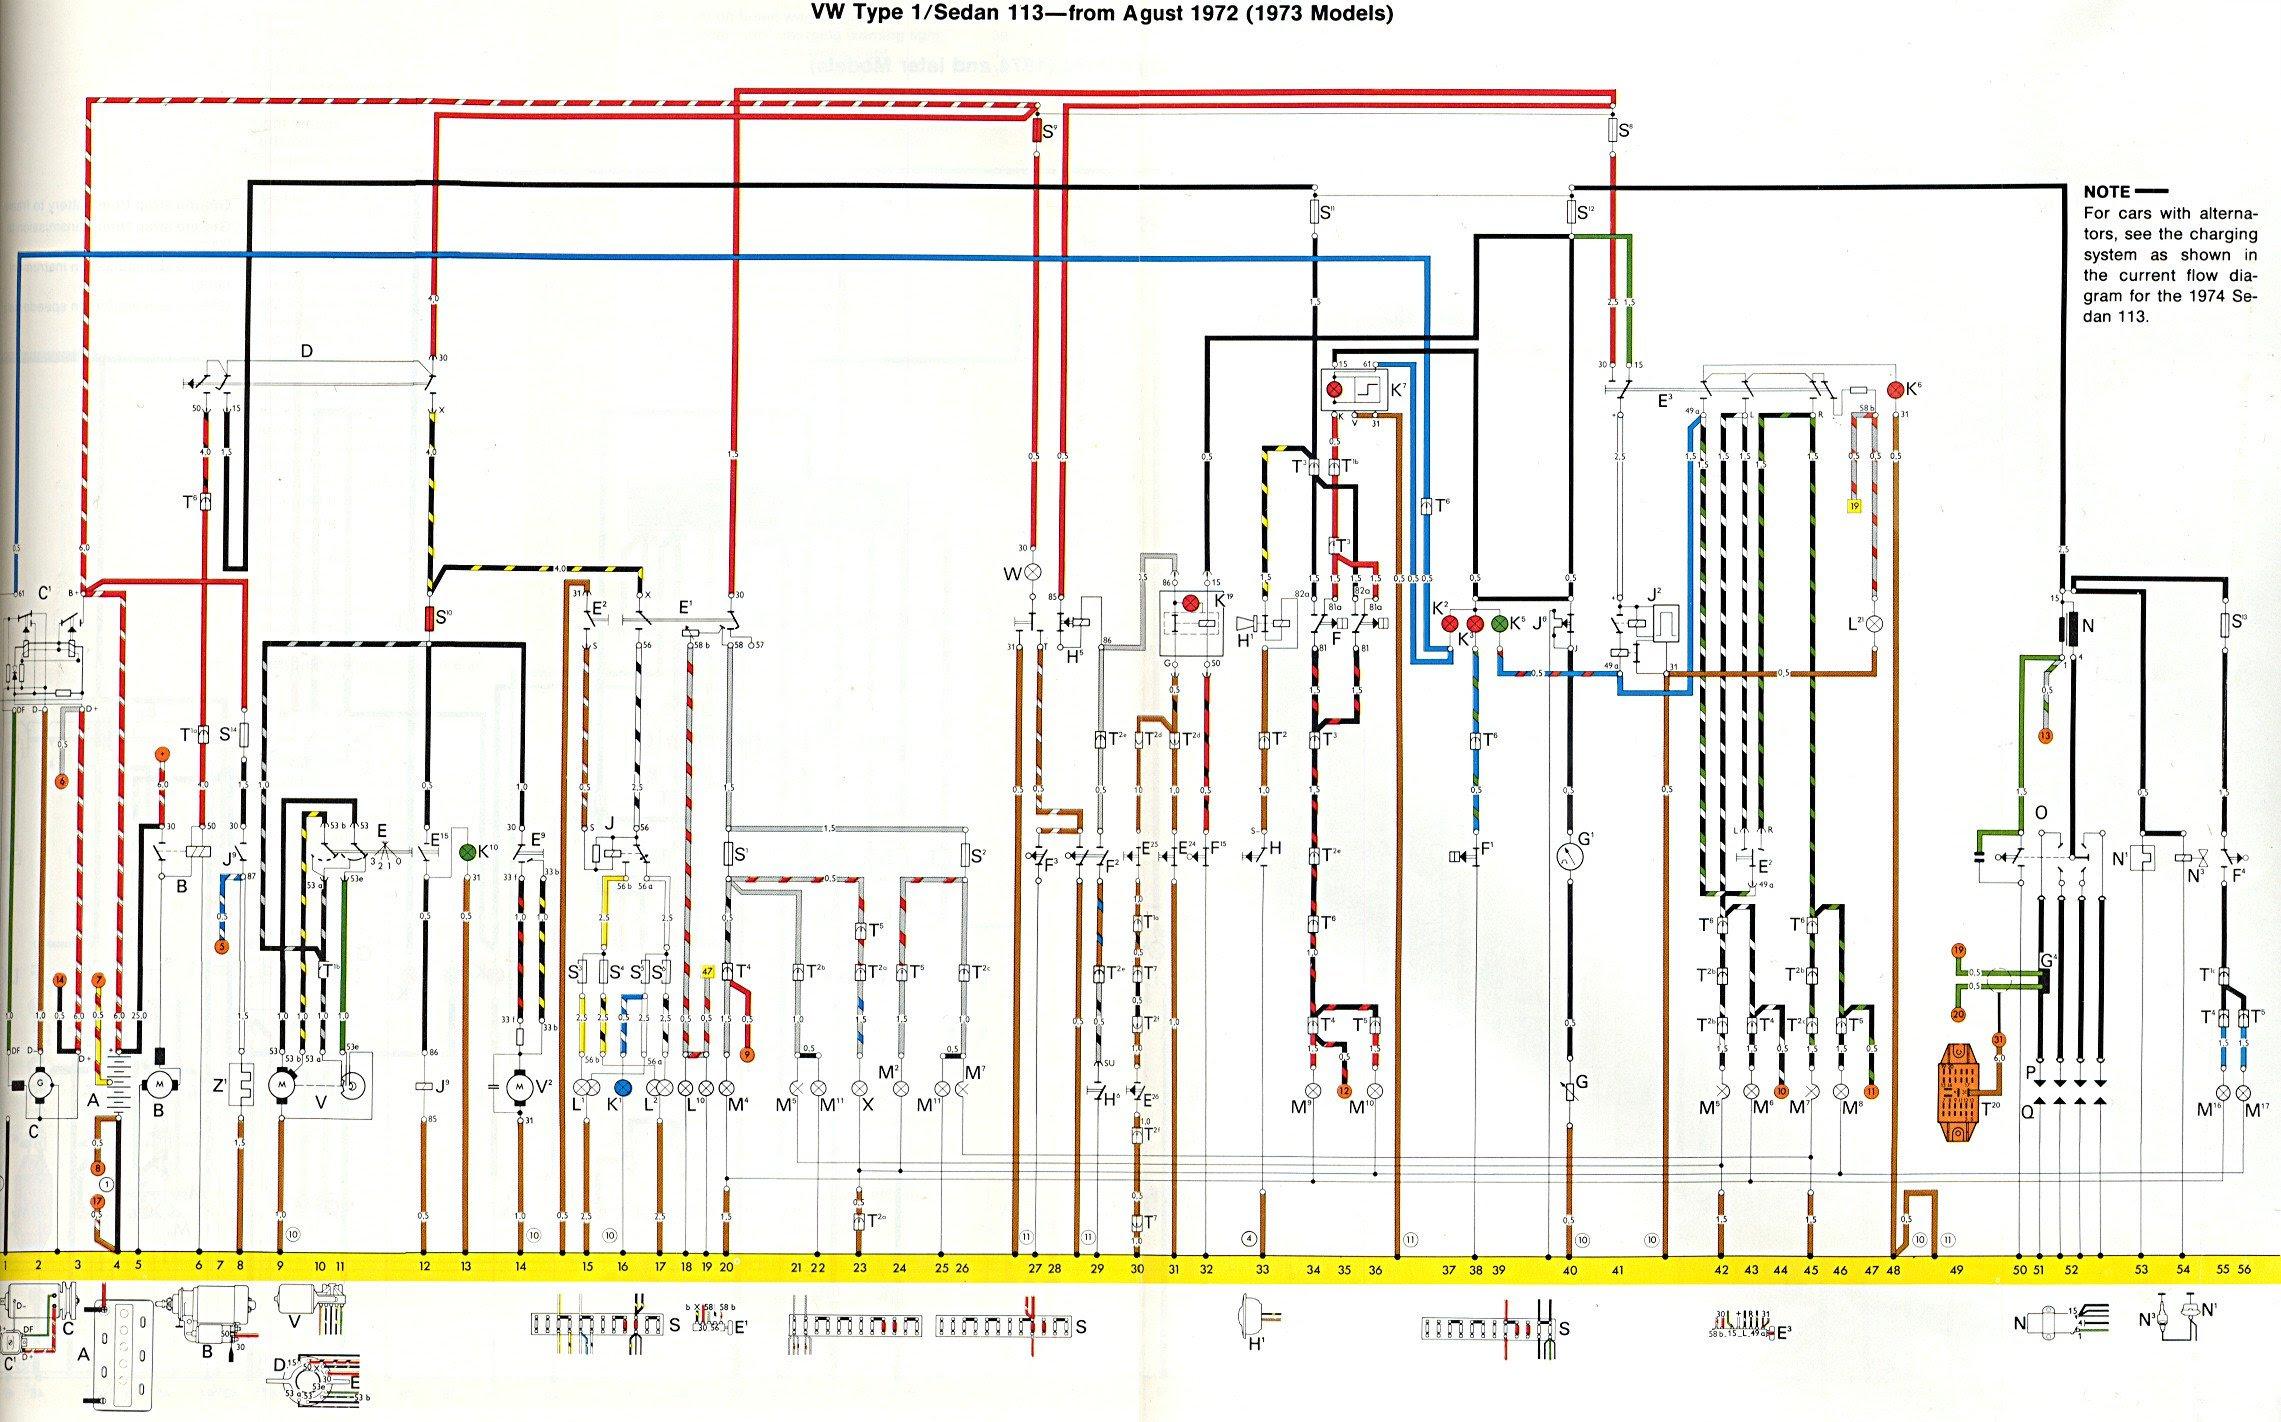 Diagram 6 Best Images Of 73 Vw Beetle Wiring Diagram Full Version Hd Quality Wiring Diagram Printkul Edilgress It